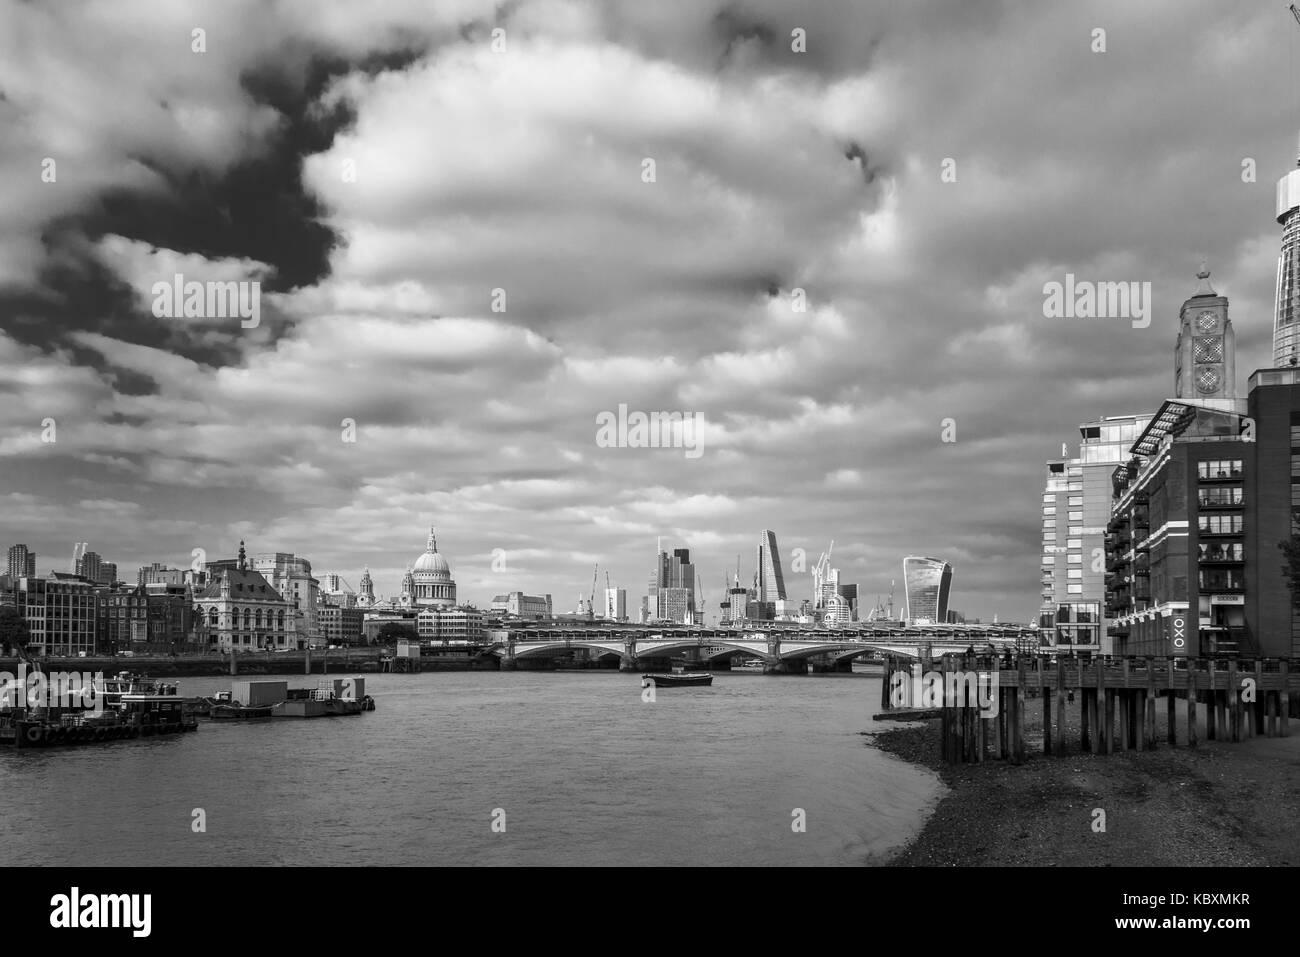 Panoramic view, City of London financial district skyline, Blackfriars  Bridge, OXO Tower,